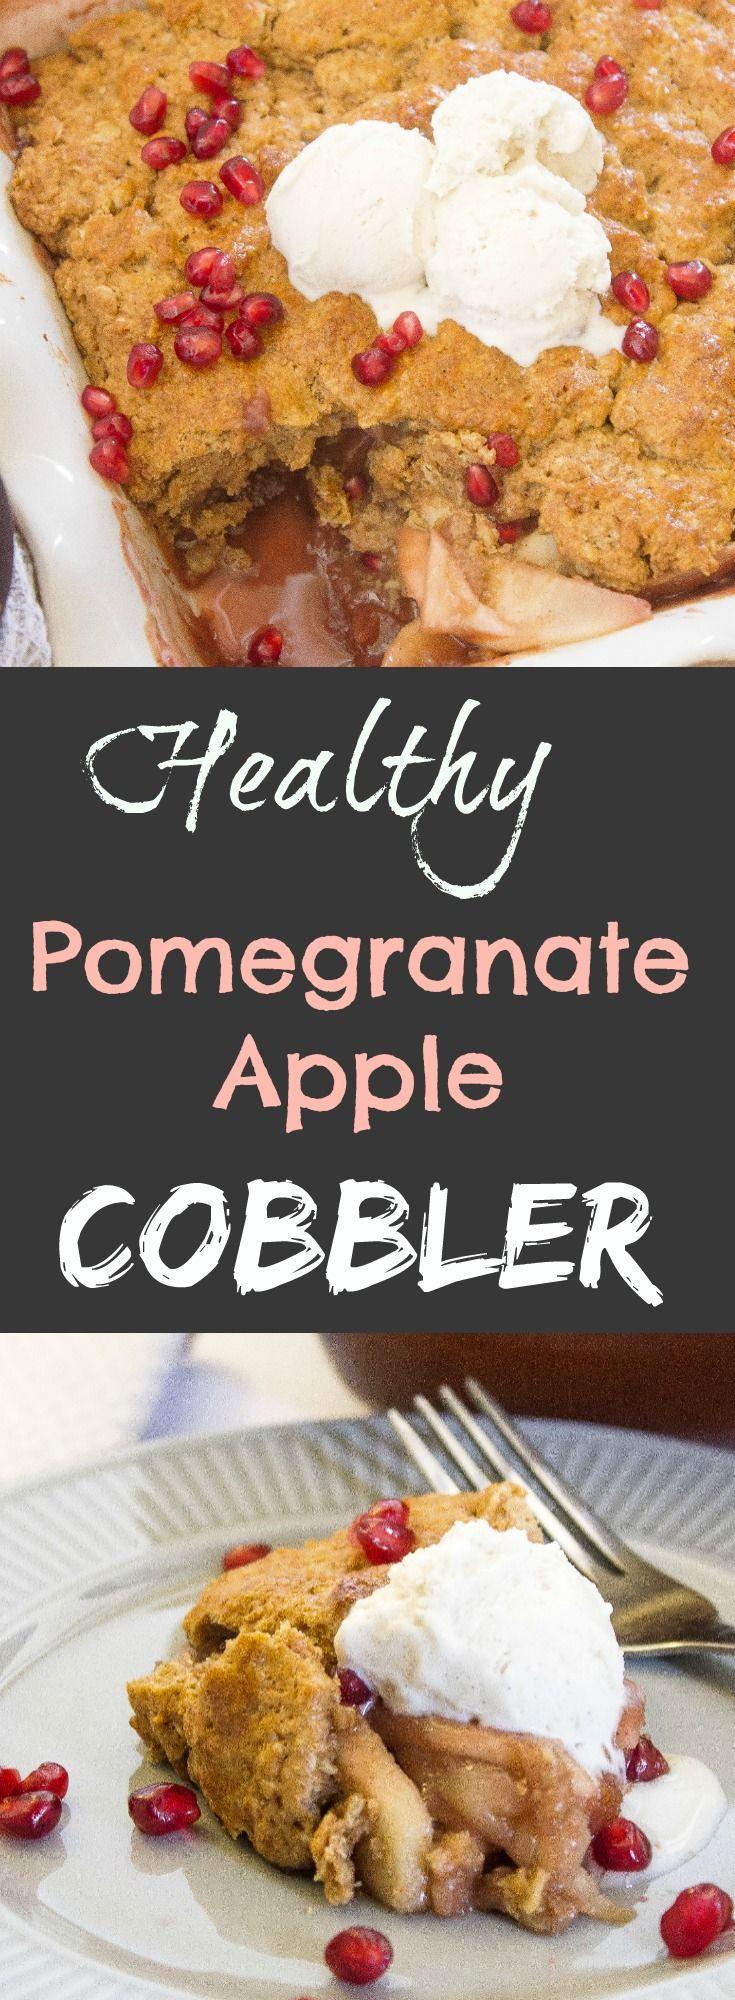 Healthy Pomegranate Apple Cobbler/ Kathryn's Kitchen